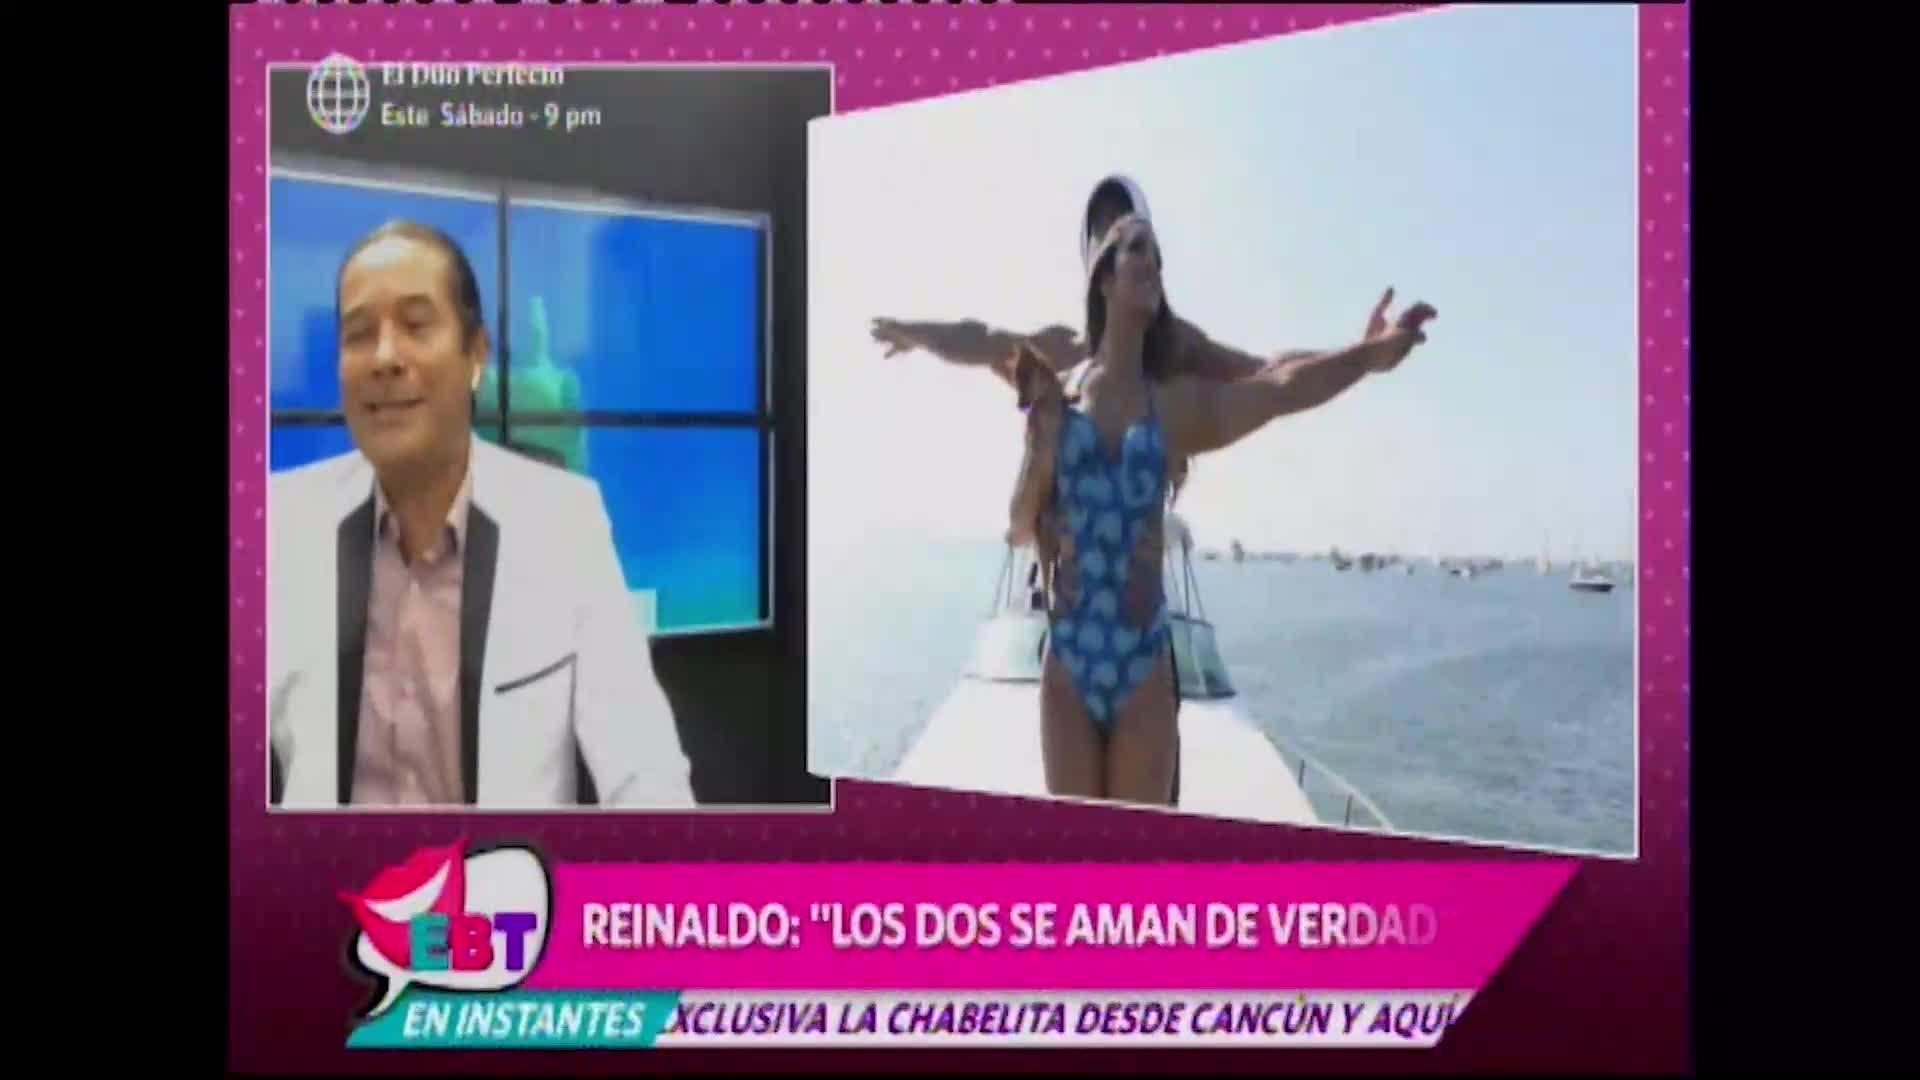 EBT: Reinaldo Dos Santos pronostica reconciliación entra Isabel Acevedo y Christian Domínguez